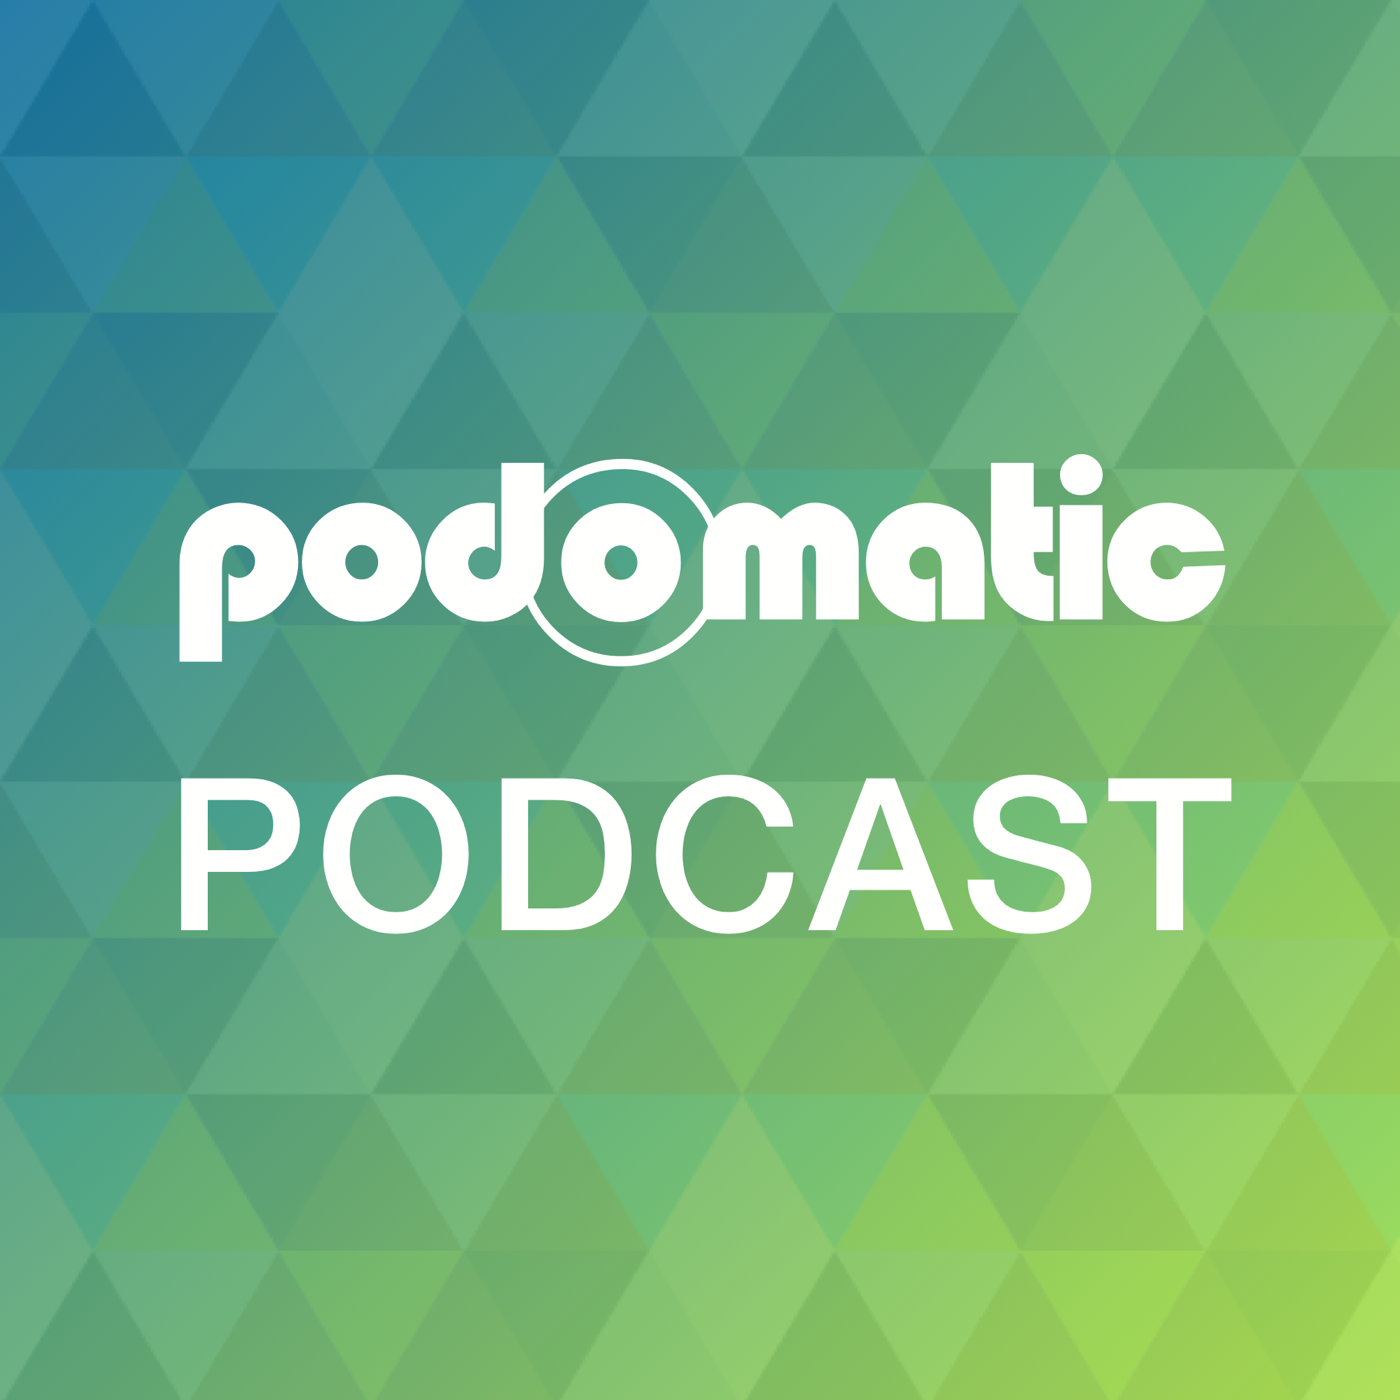 Ubox's Podcast